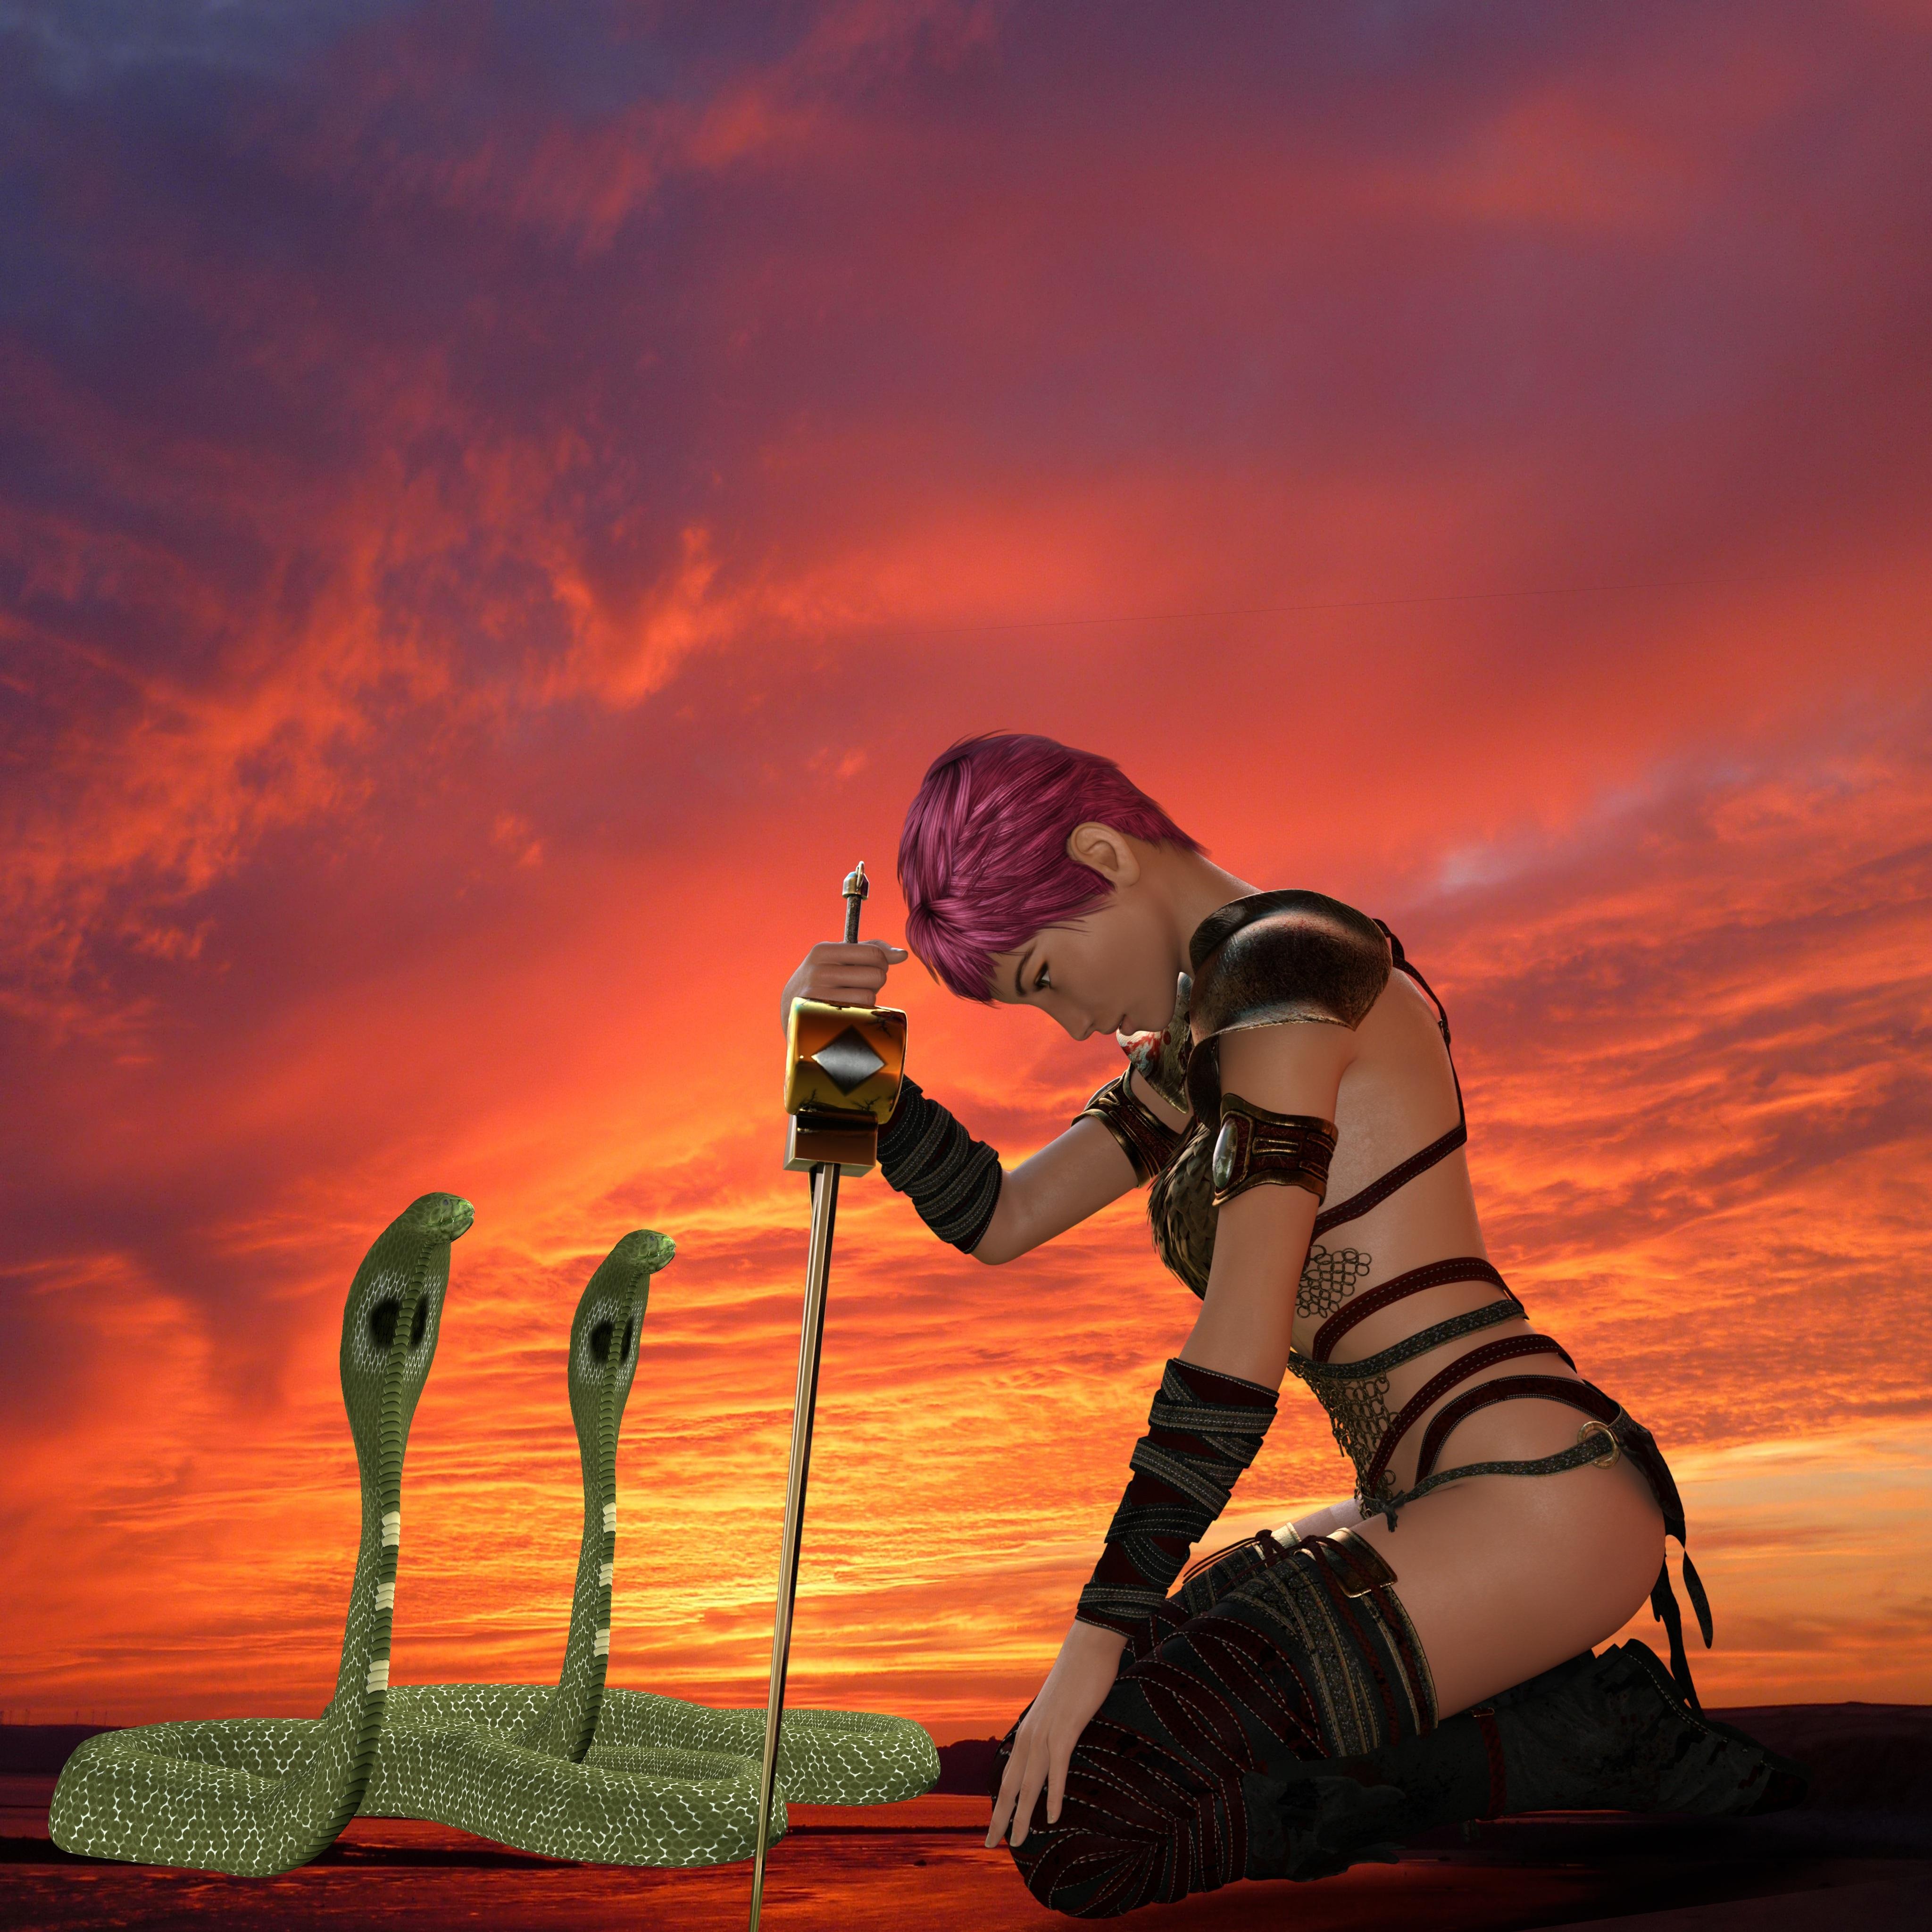 Warrior Fantasy Render, Pride, Warrior, Sword, Snakes, HQ Photo